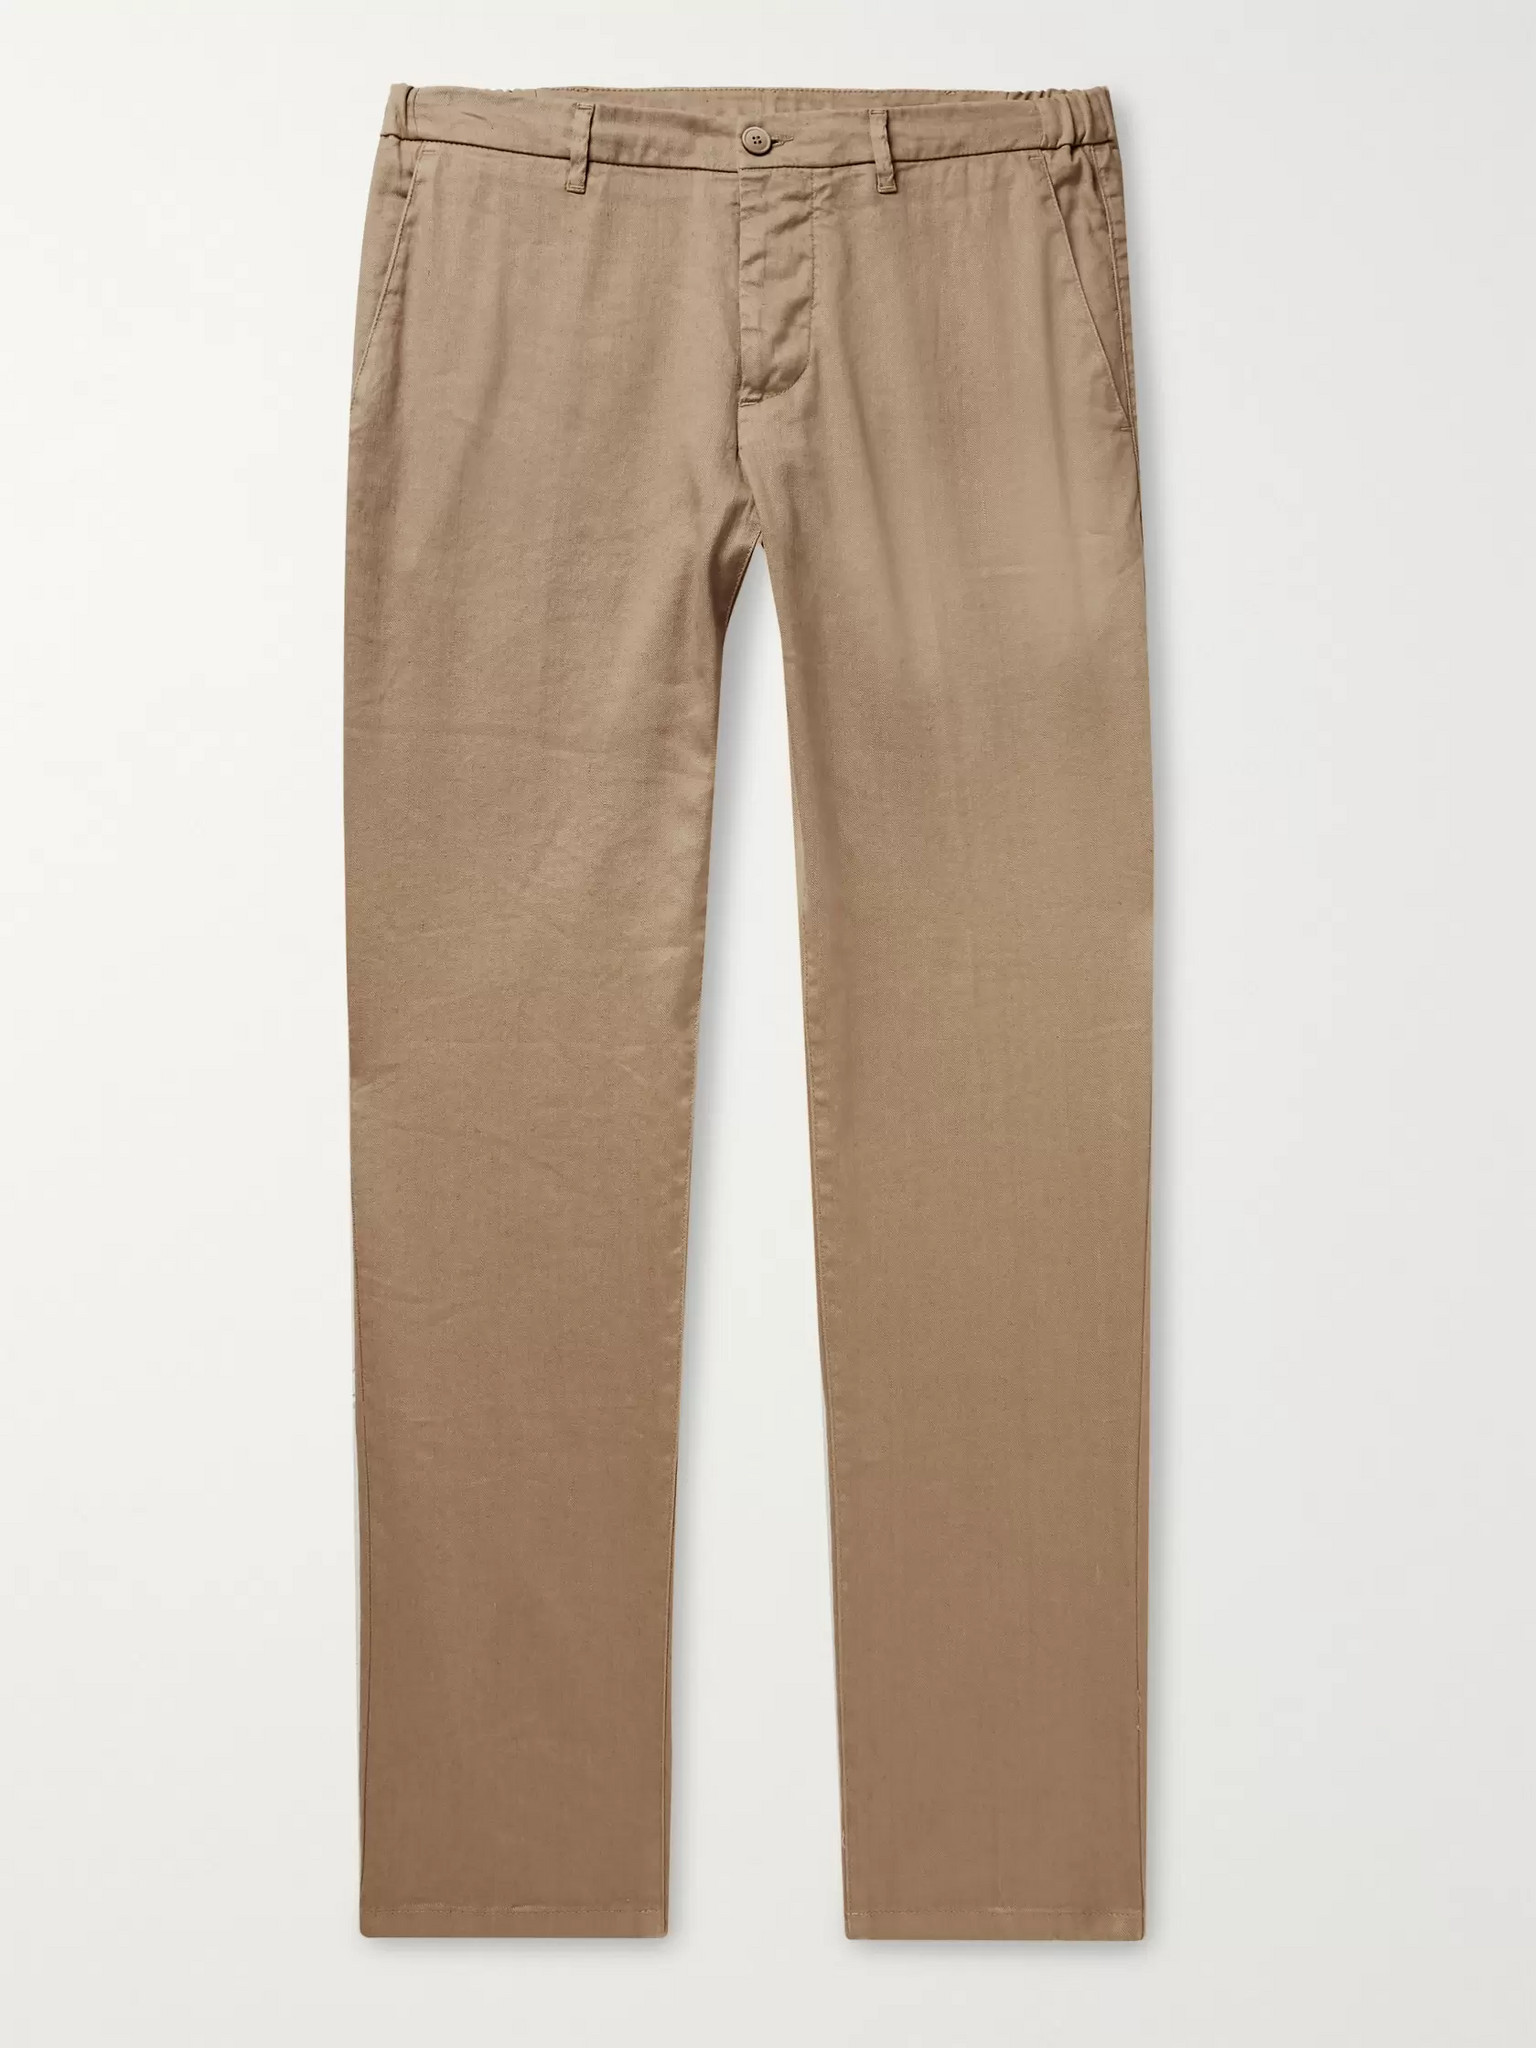 Altea Dumbo Slim-Fit Linen-Blend Twill Trousers